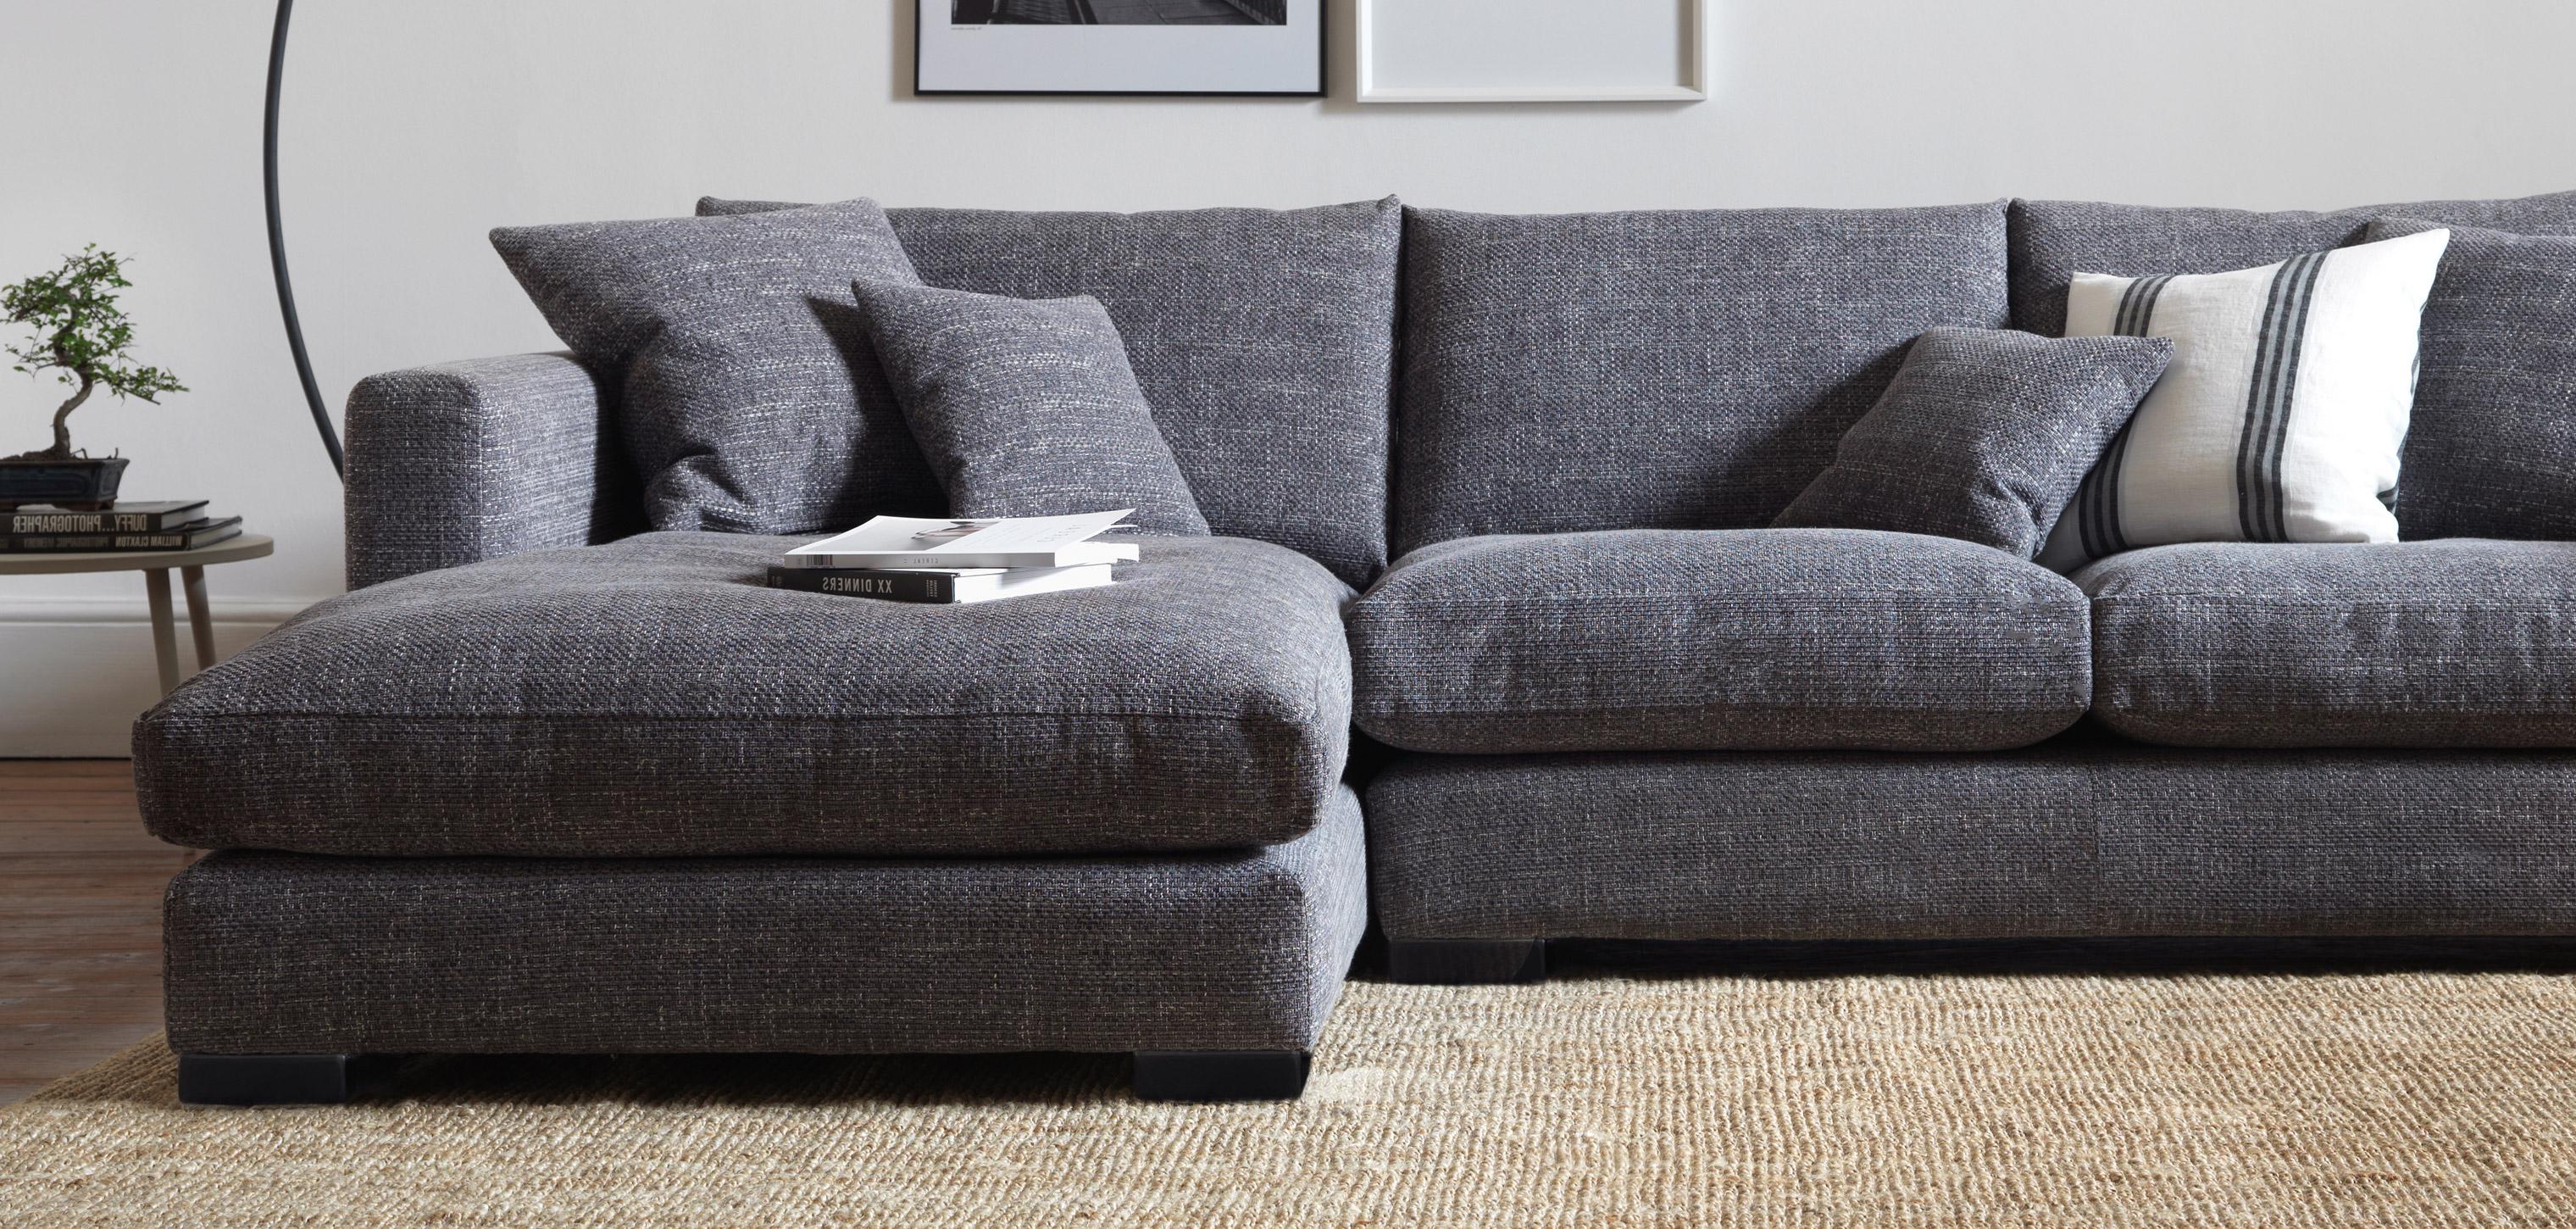 Sofa Modular Kvdd Modular Corner sofas In All Shapes Sizes sofa Workshop